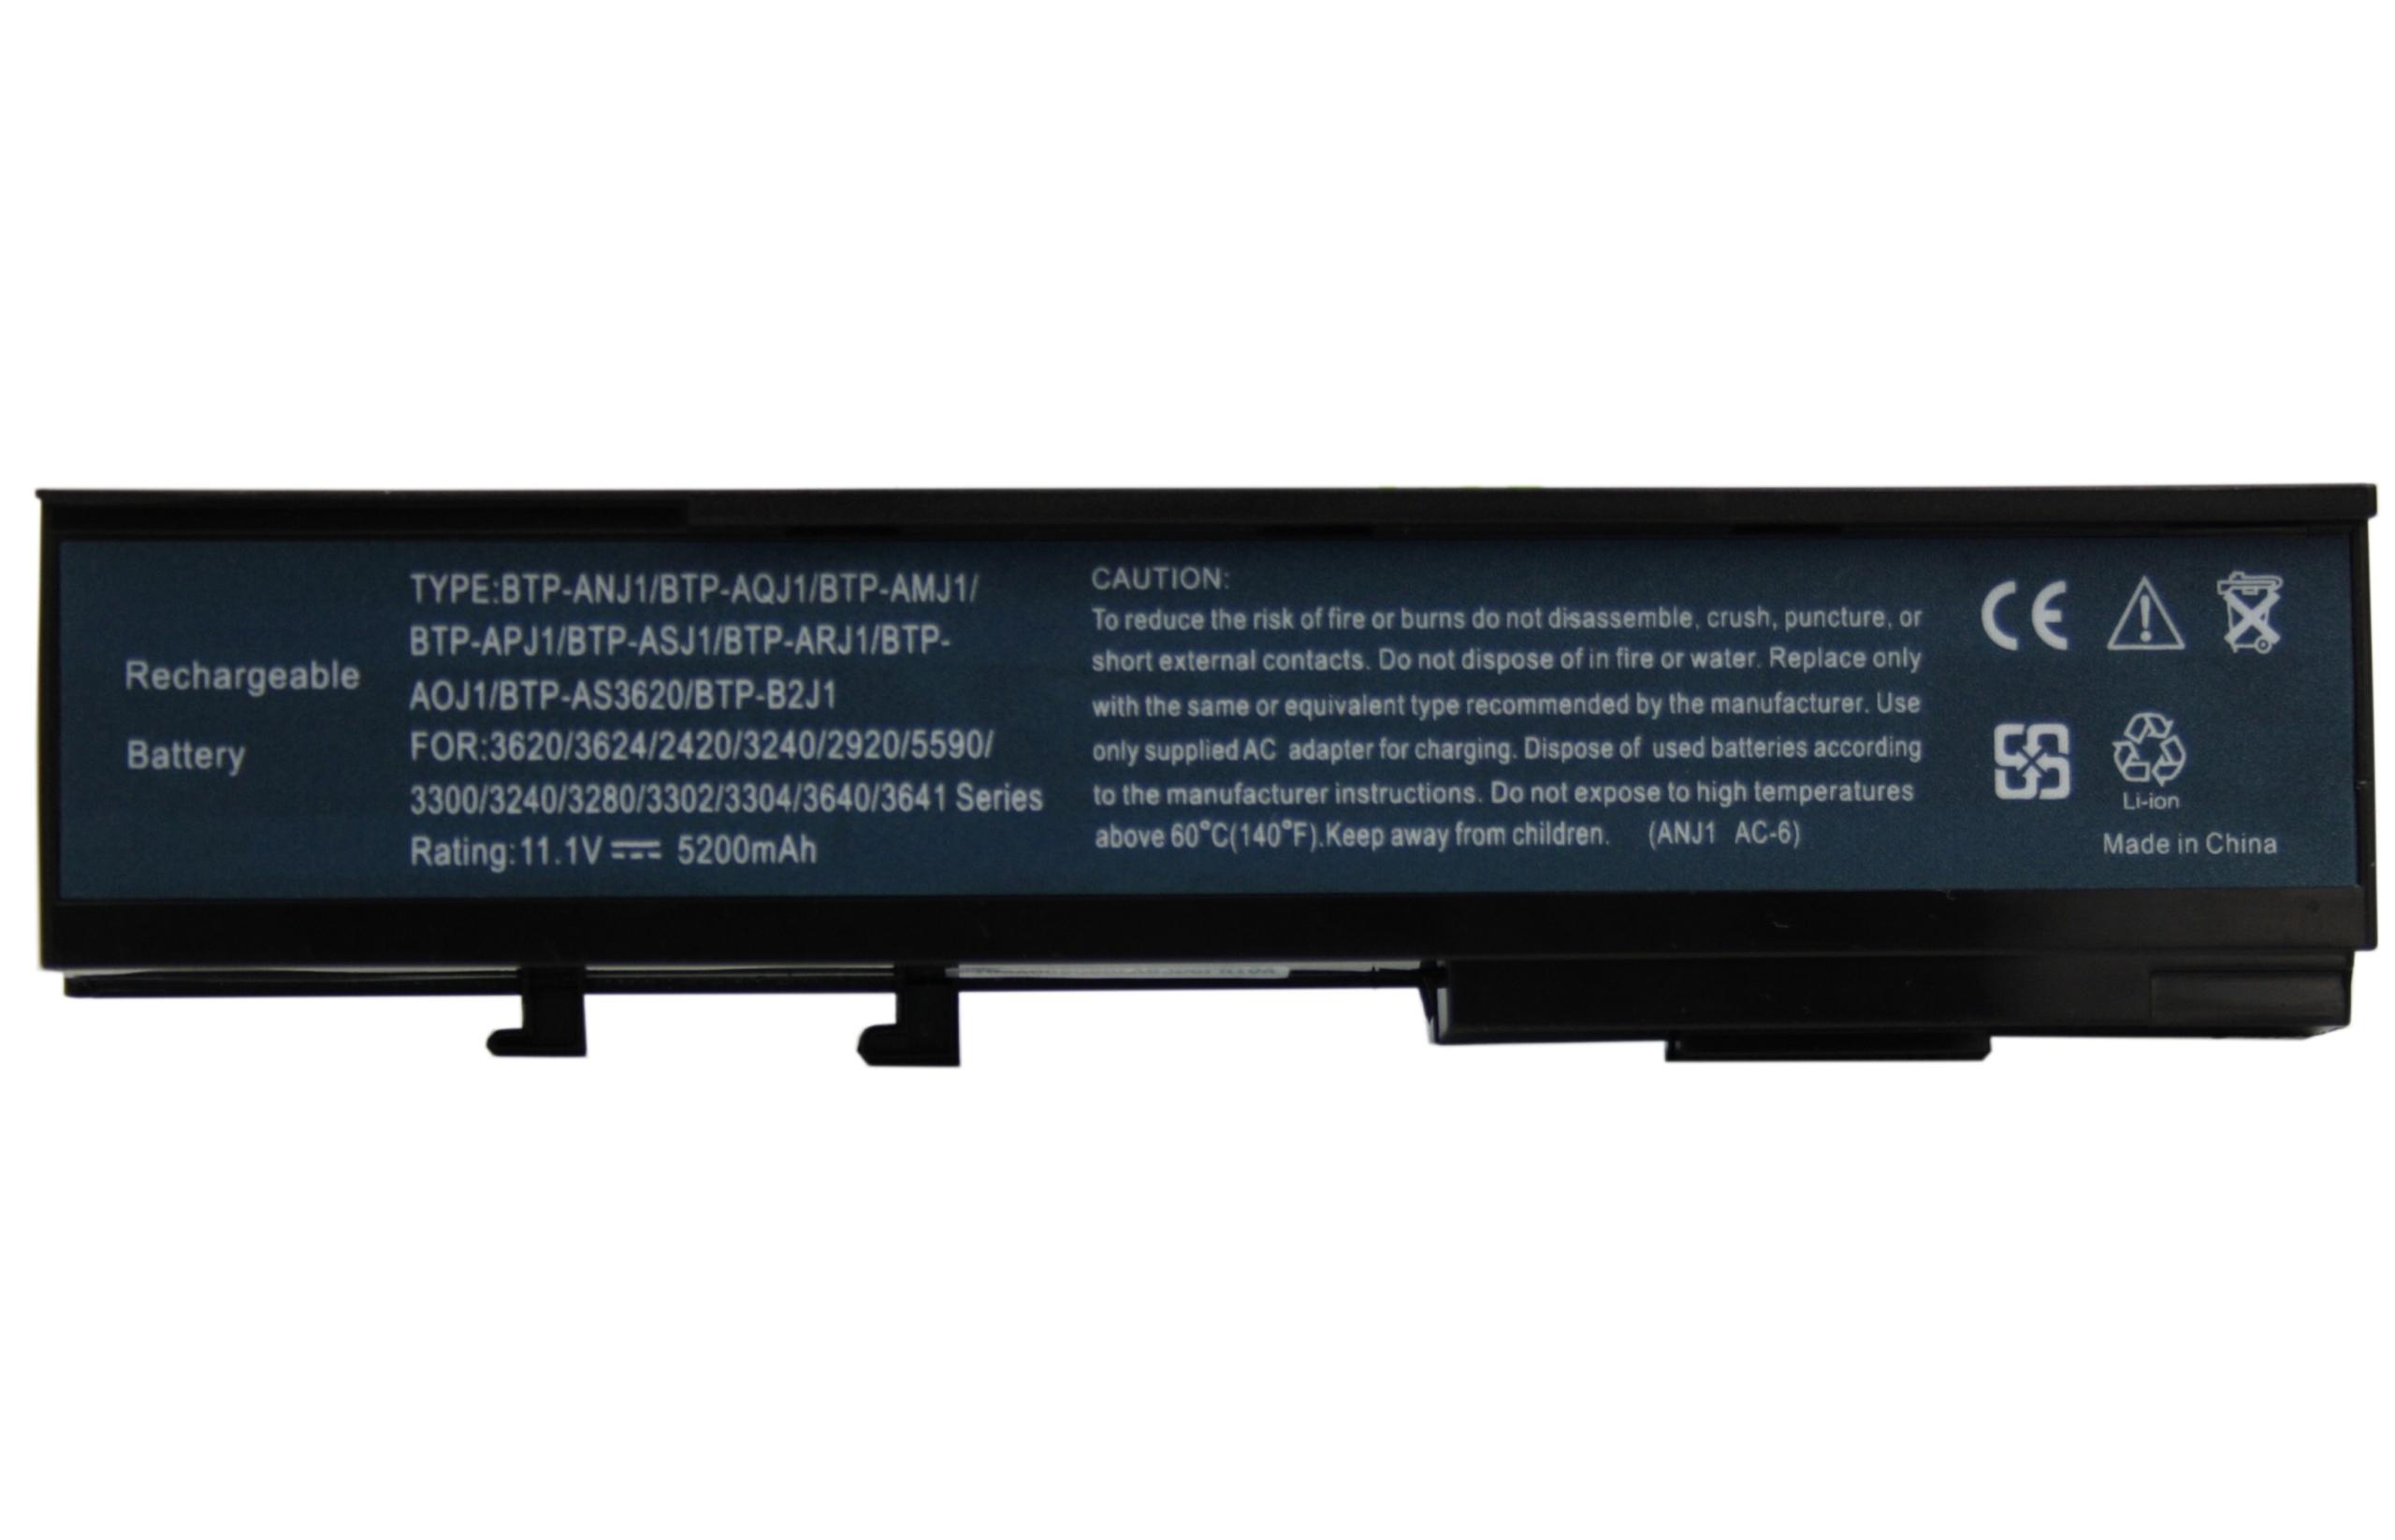 BATERIA AKUMULATOR ACER 2420 6292 6492 6493 6553 BTP-ARJ1 - Baterie do laptopów